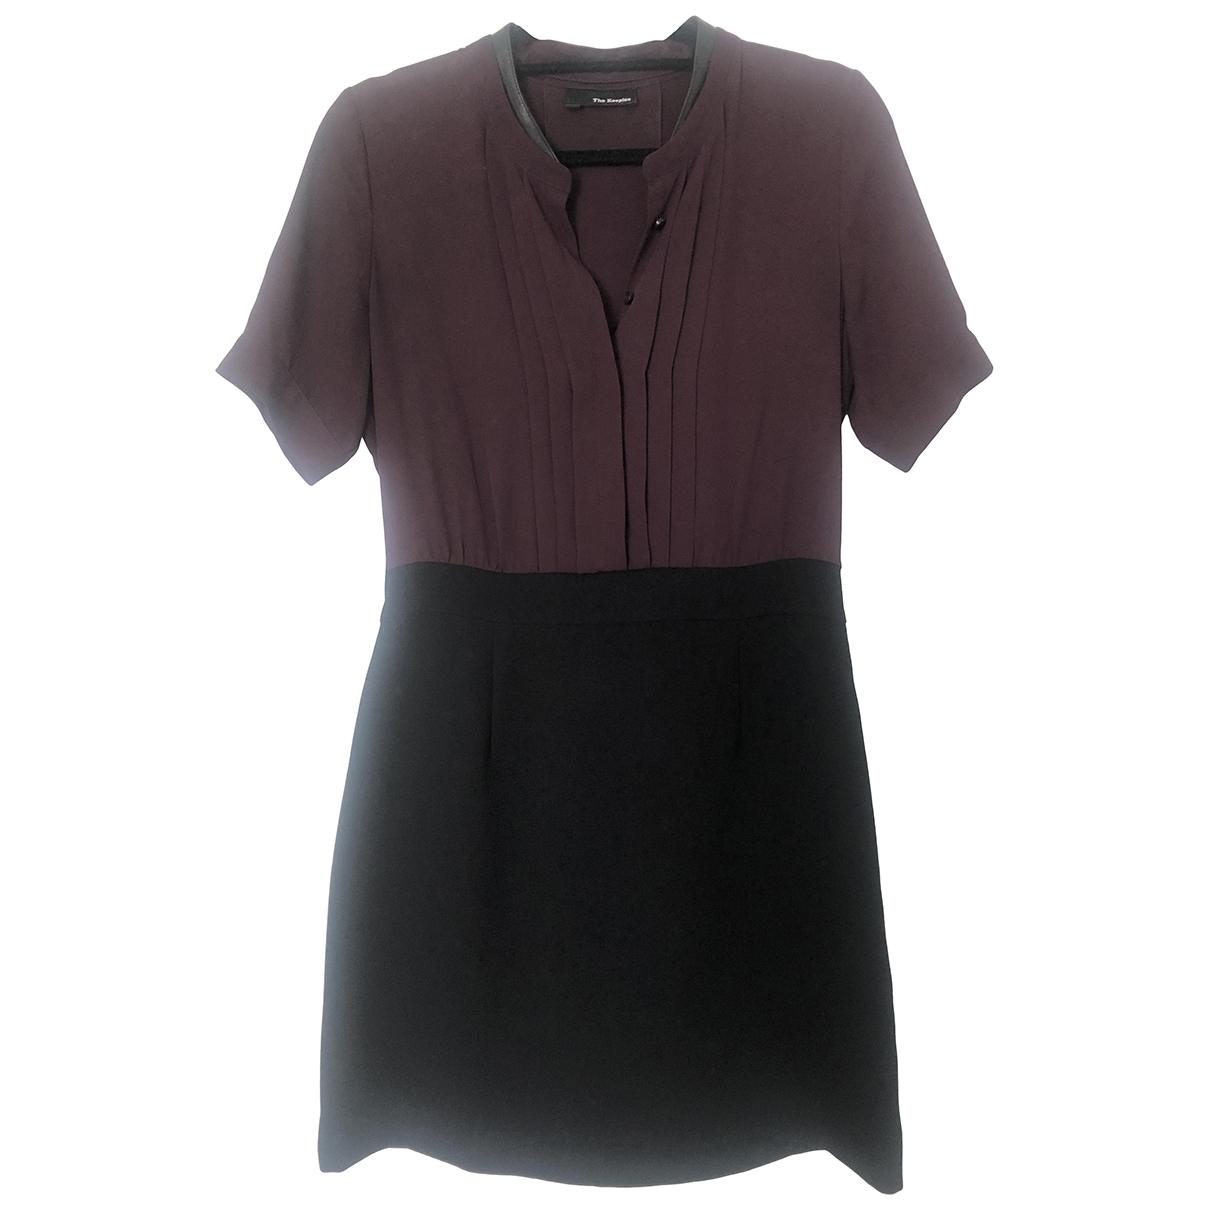 The Kooples Fall Winter 2019 Burgundy dress for Women M International